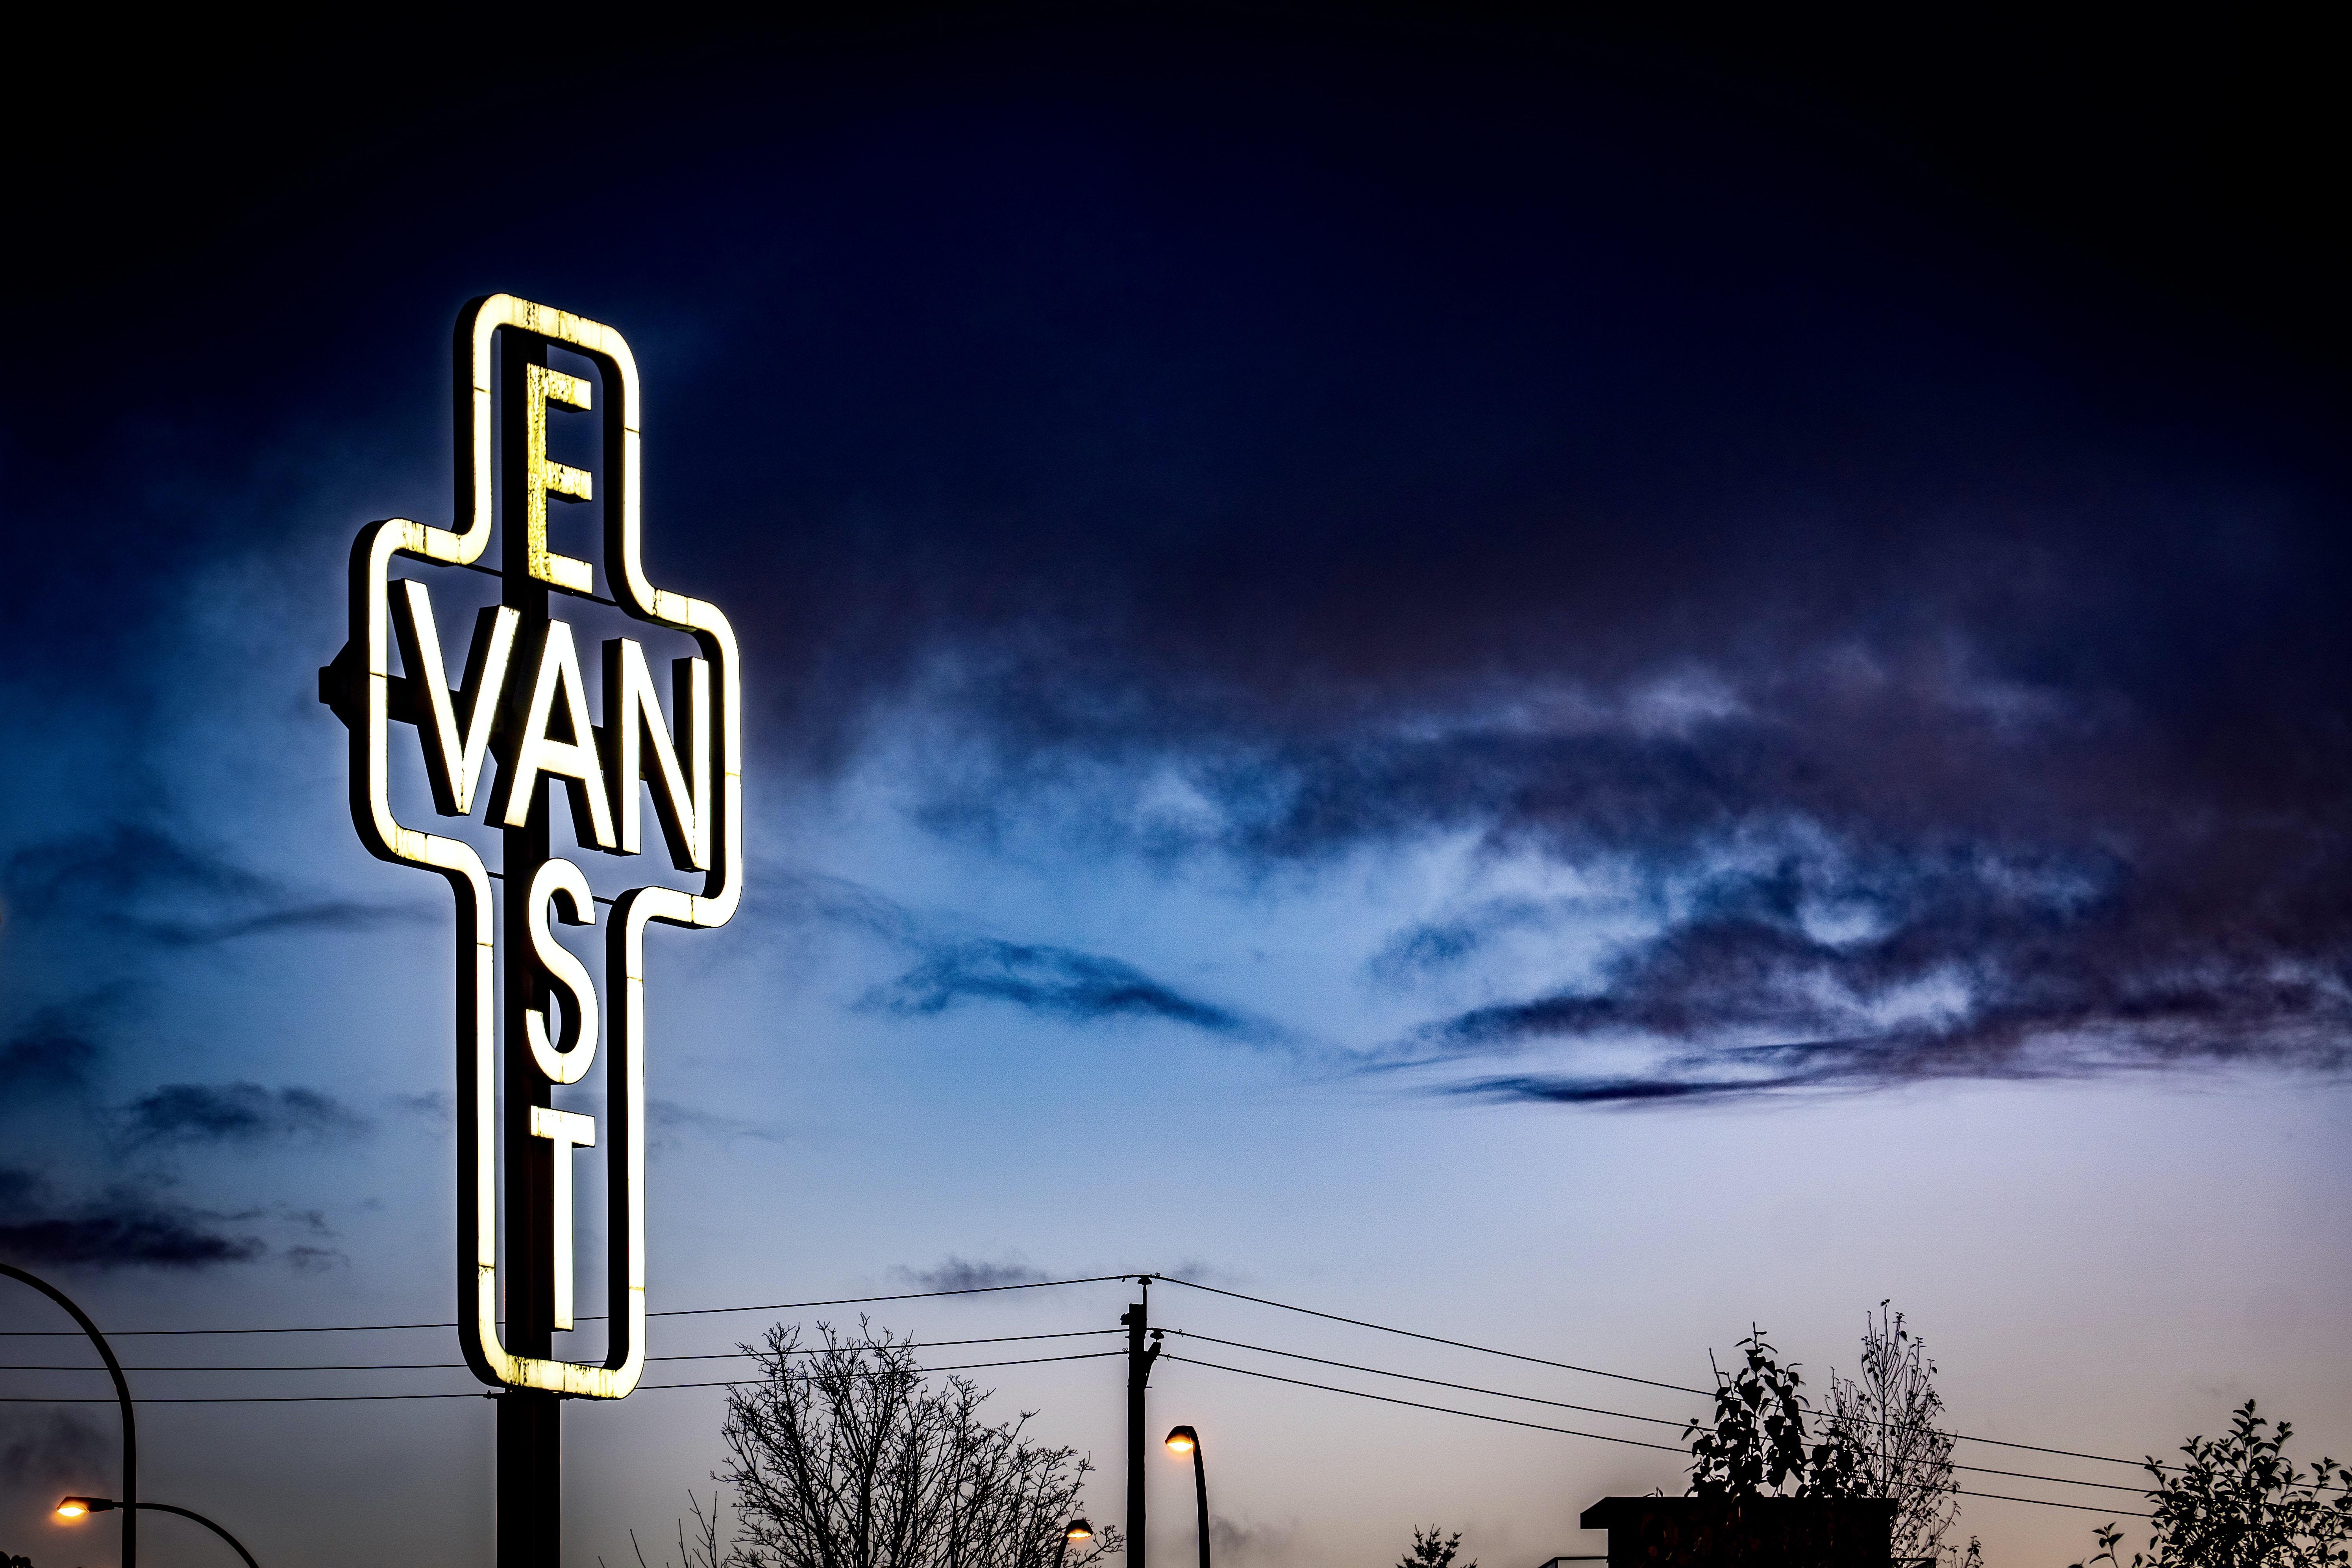 east van signage